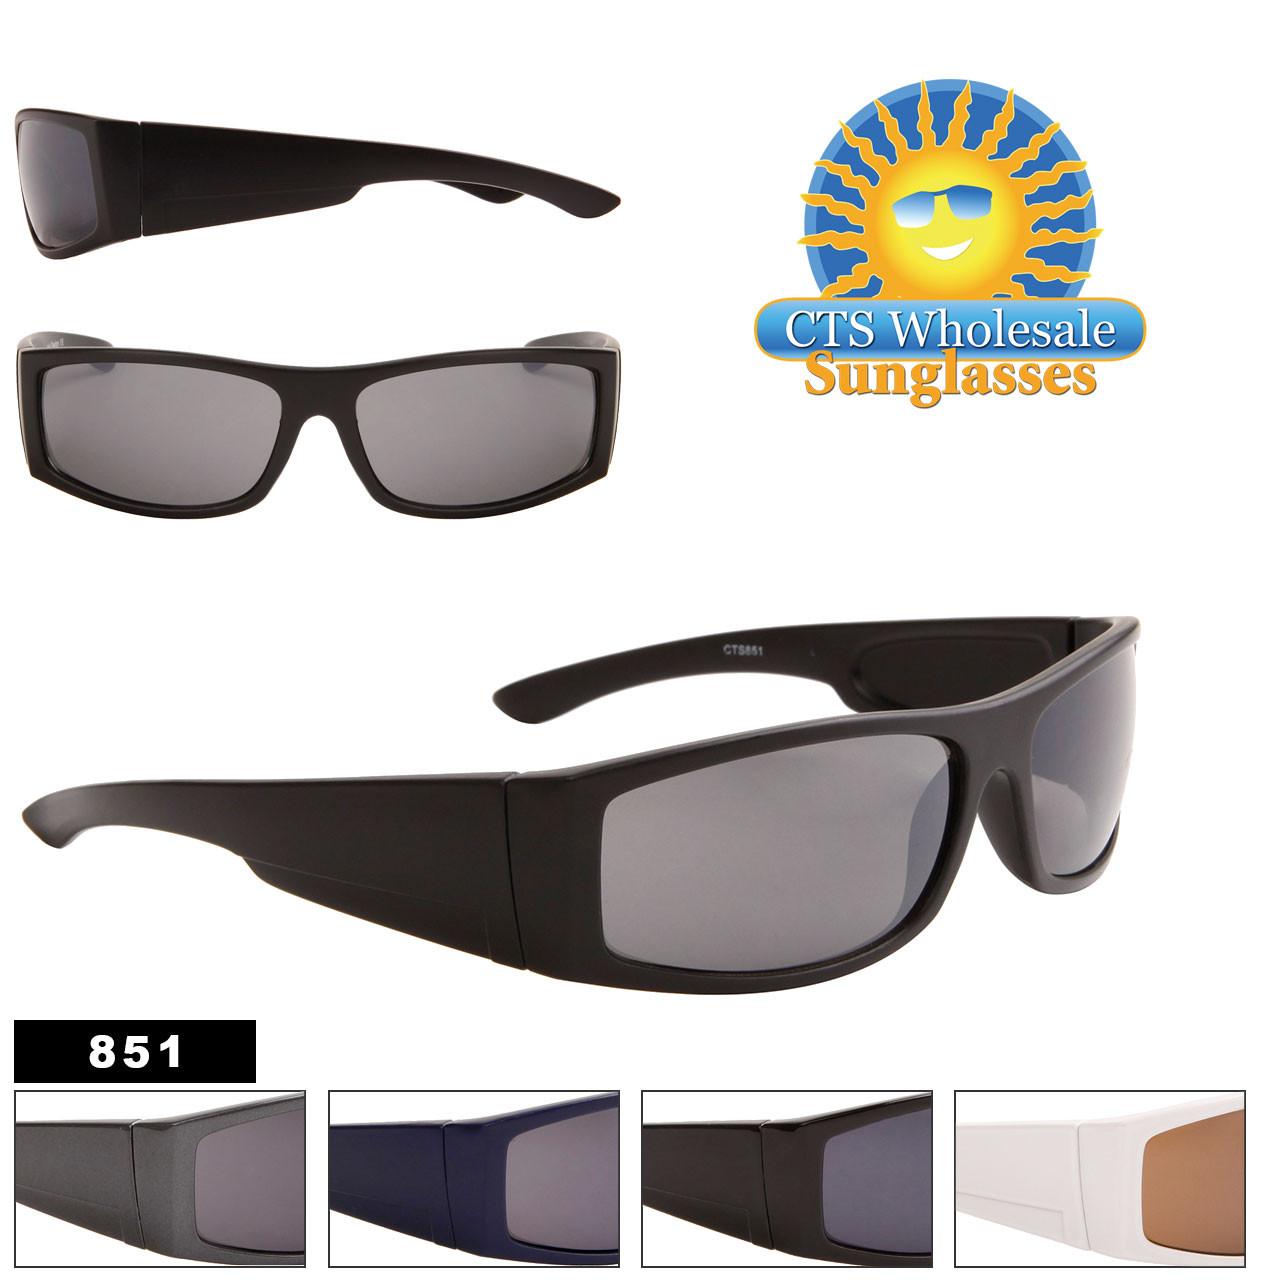 Men's Sunglasses by the Dozen - Style #851